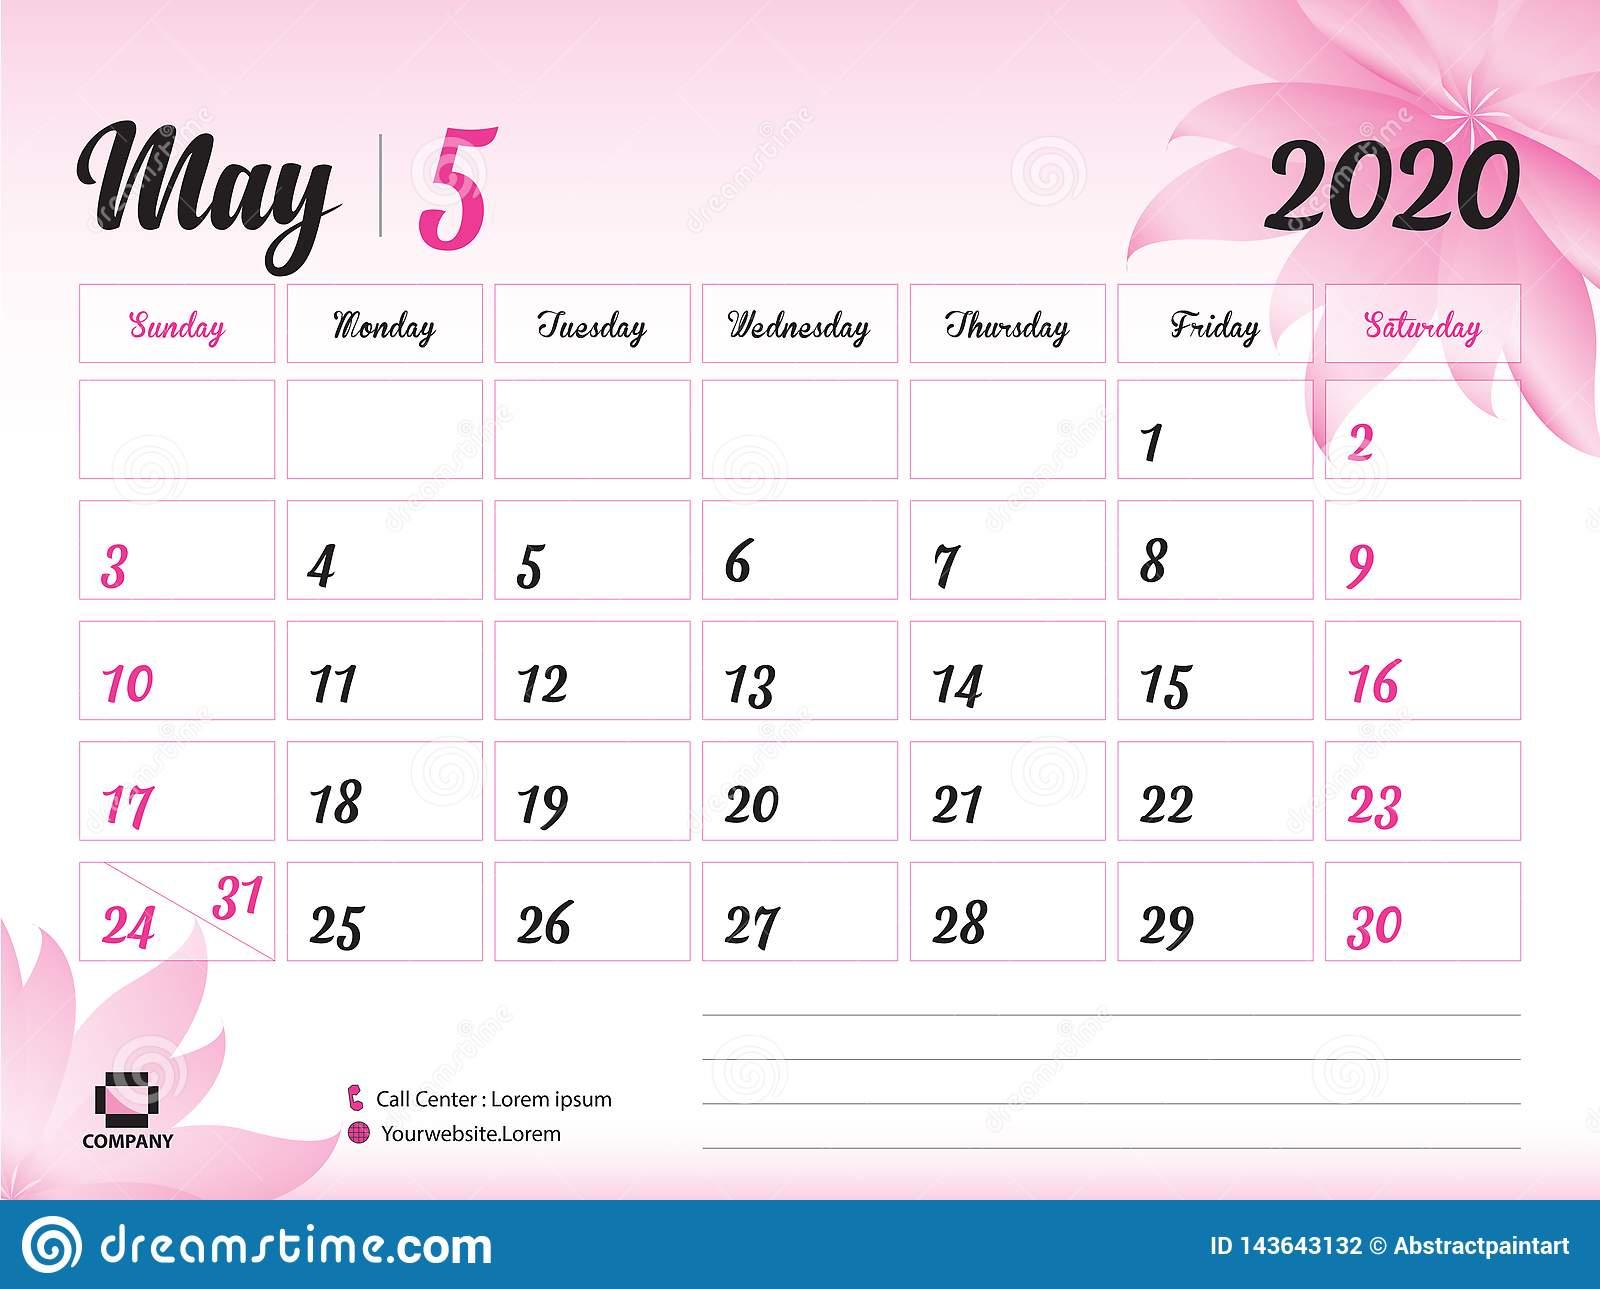 May 2020 Year Template, Calendar 2020 Vector, Desk Calendar intended for Festive Printable Calendar 2020